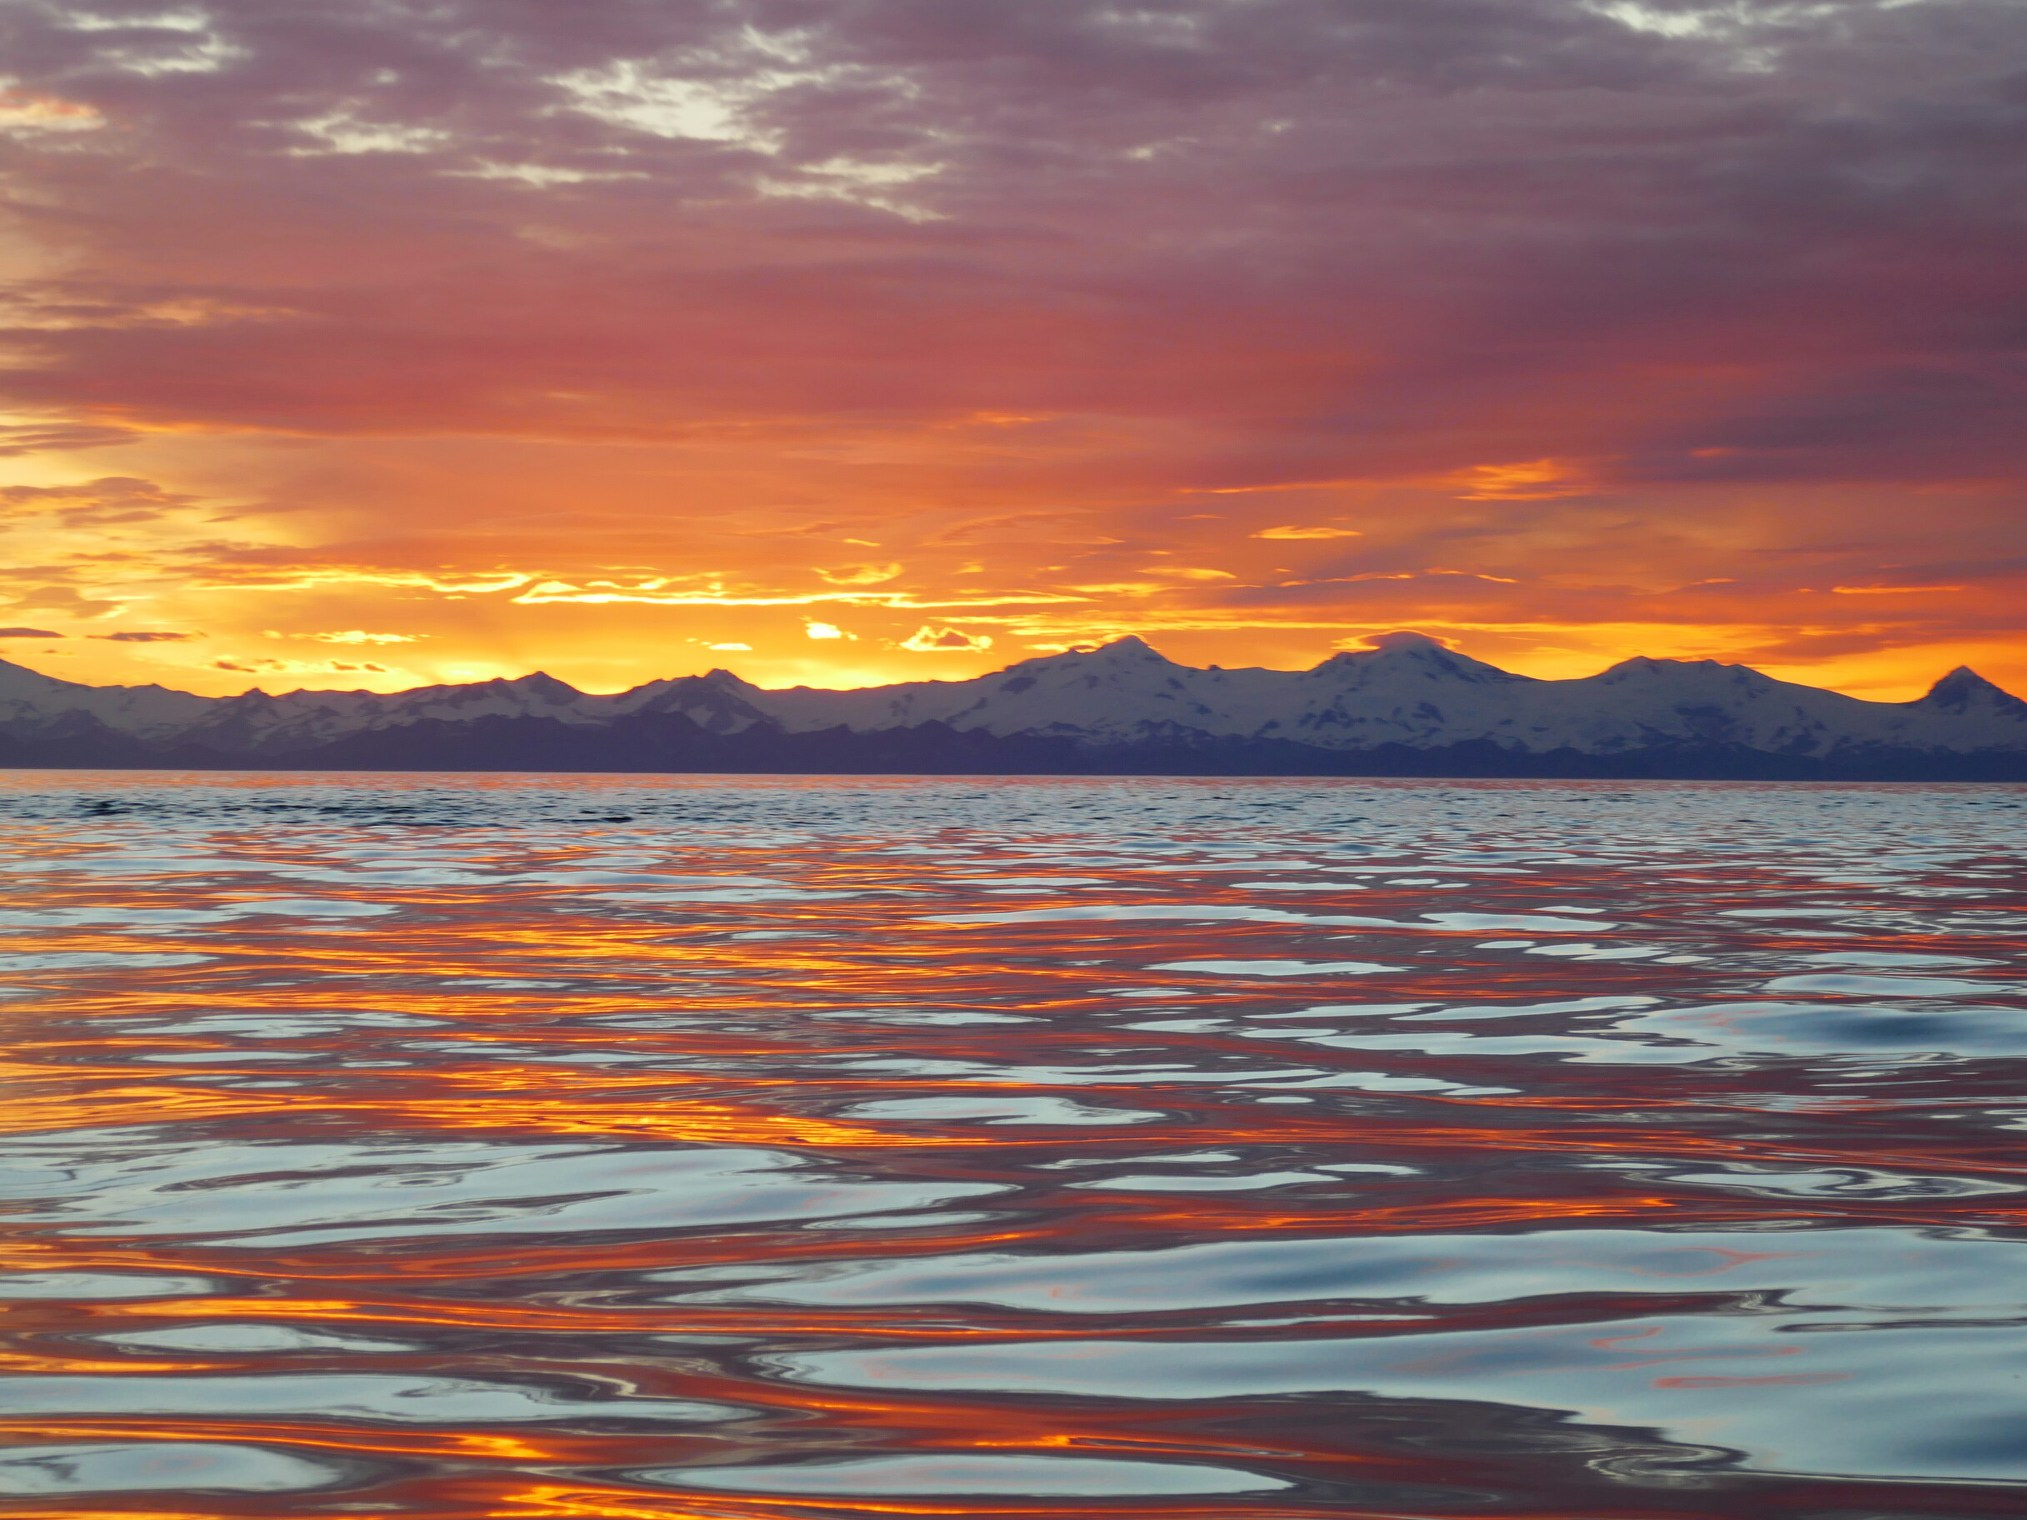 Summer Solstice sunset, Uganik Bay. 11:15 pm